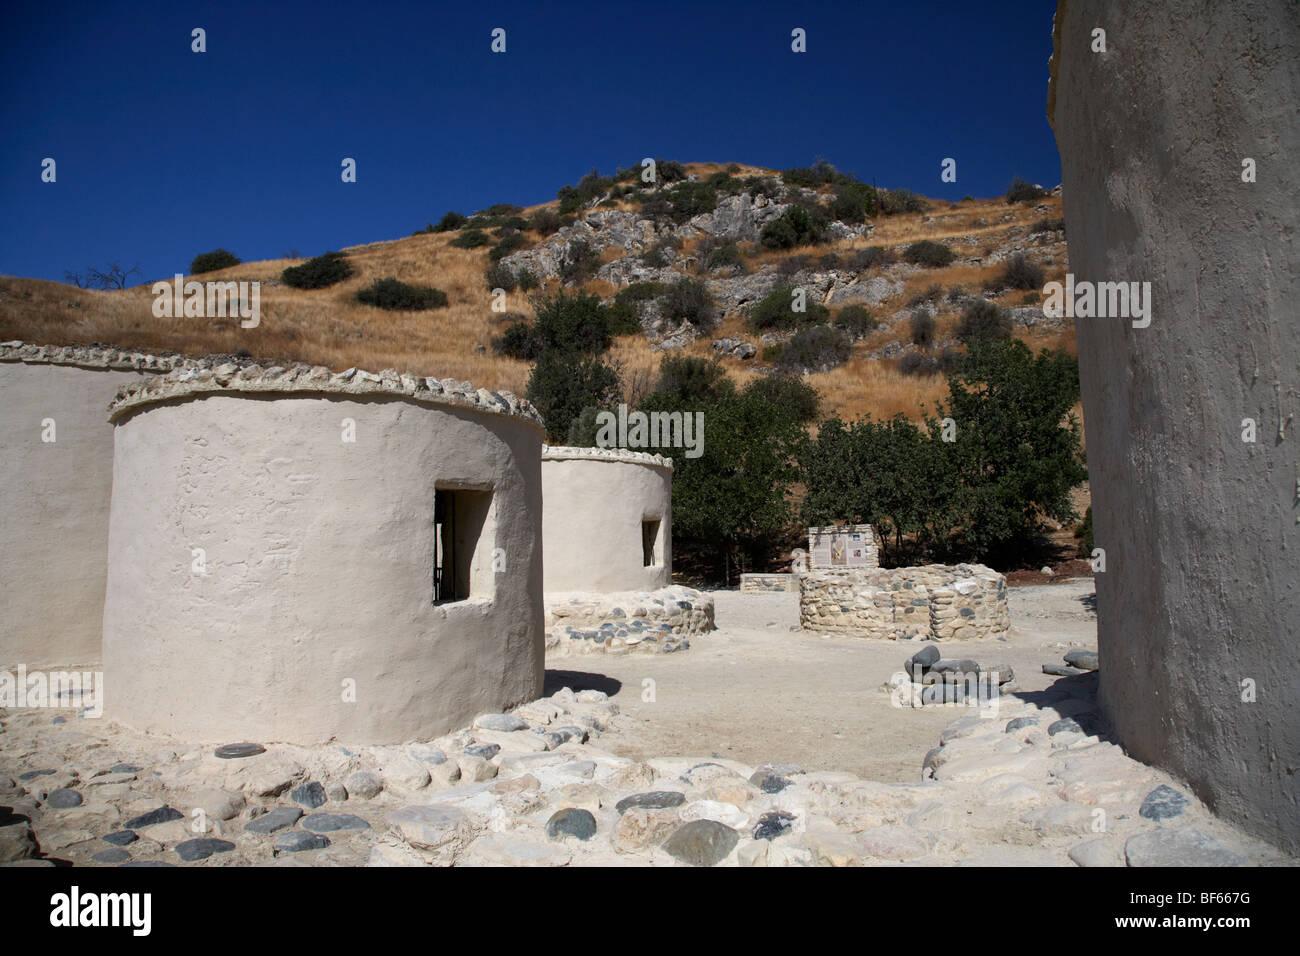 reconstruction of Choirokoitia ancient neolithic village settlement republic of cyprus Stock Photo